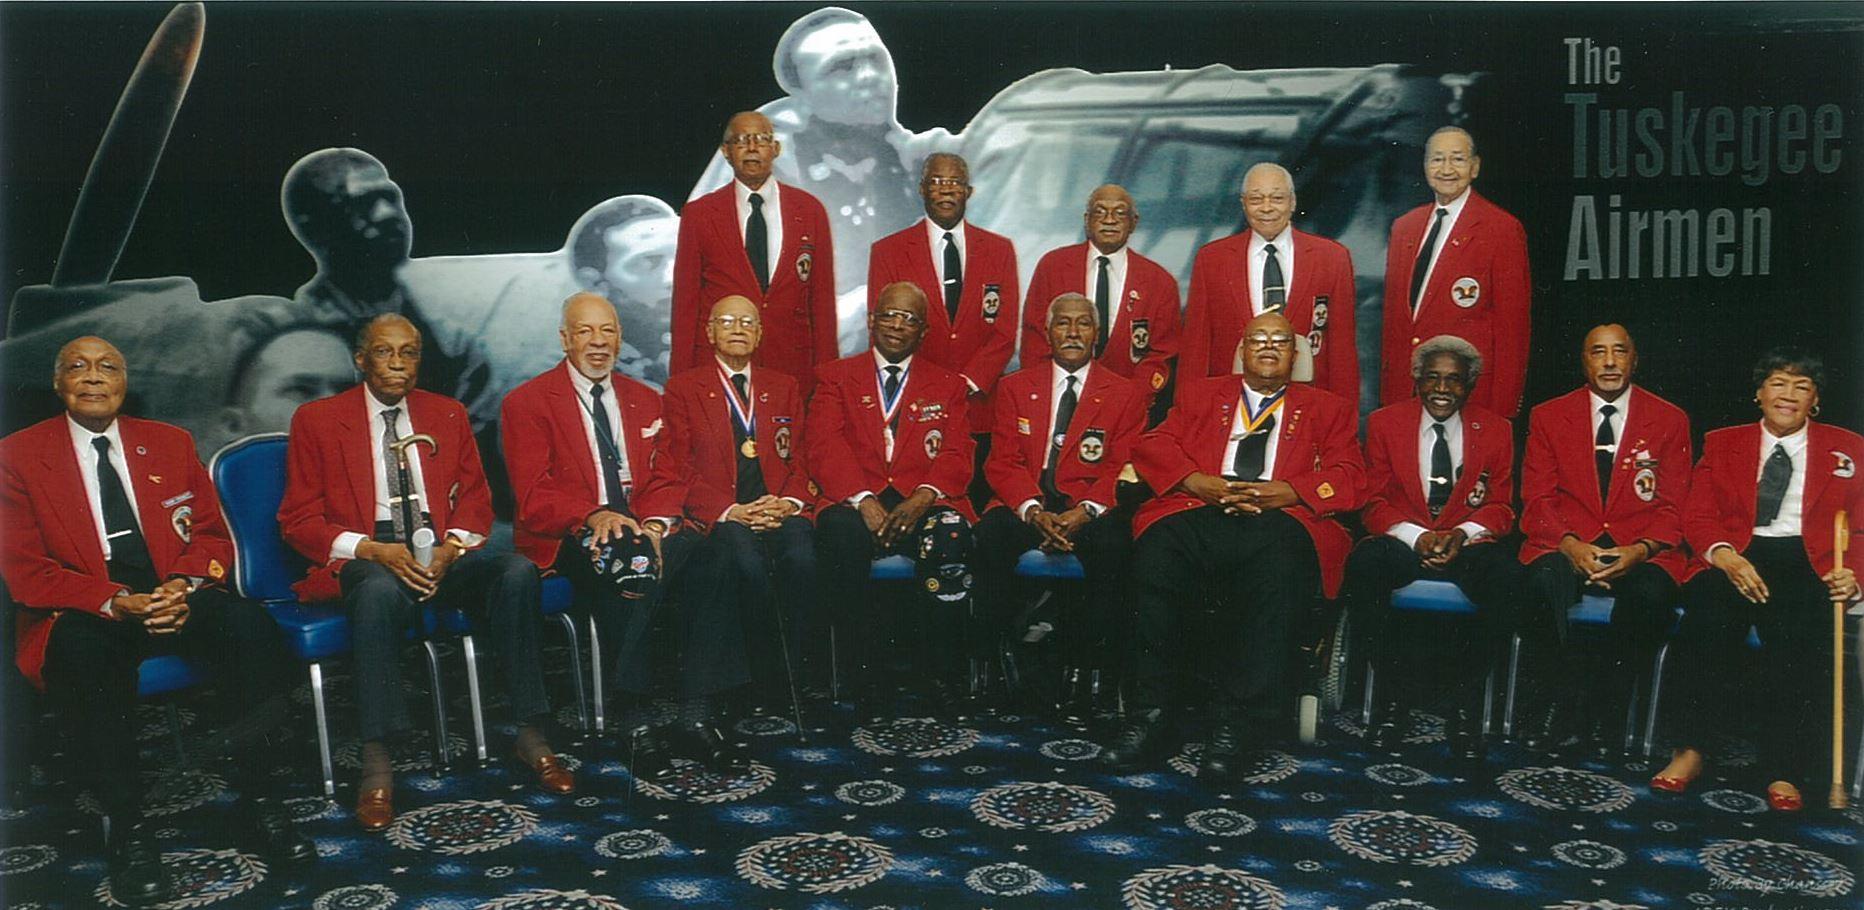 Martin Sheet Metal >> ECCTAI - Documented Original Tuskegee Airmen